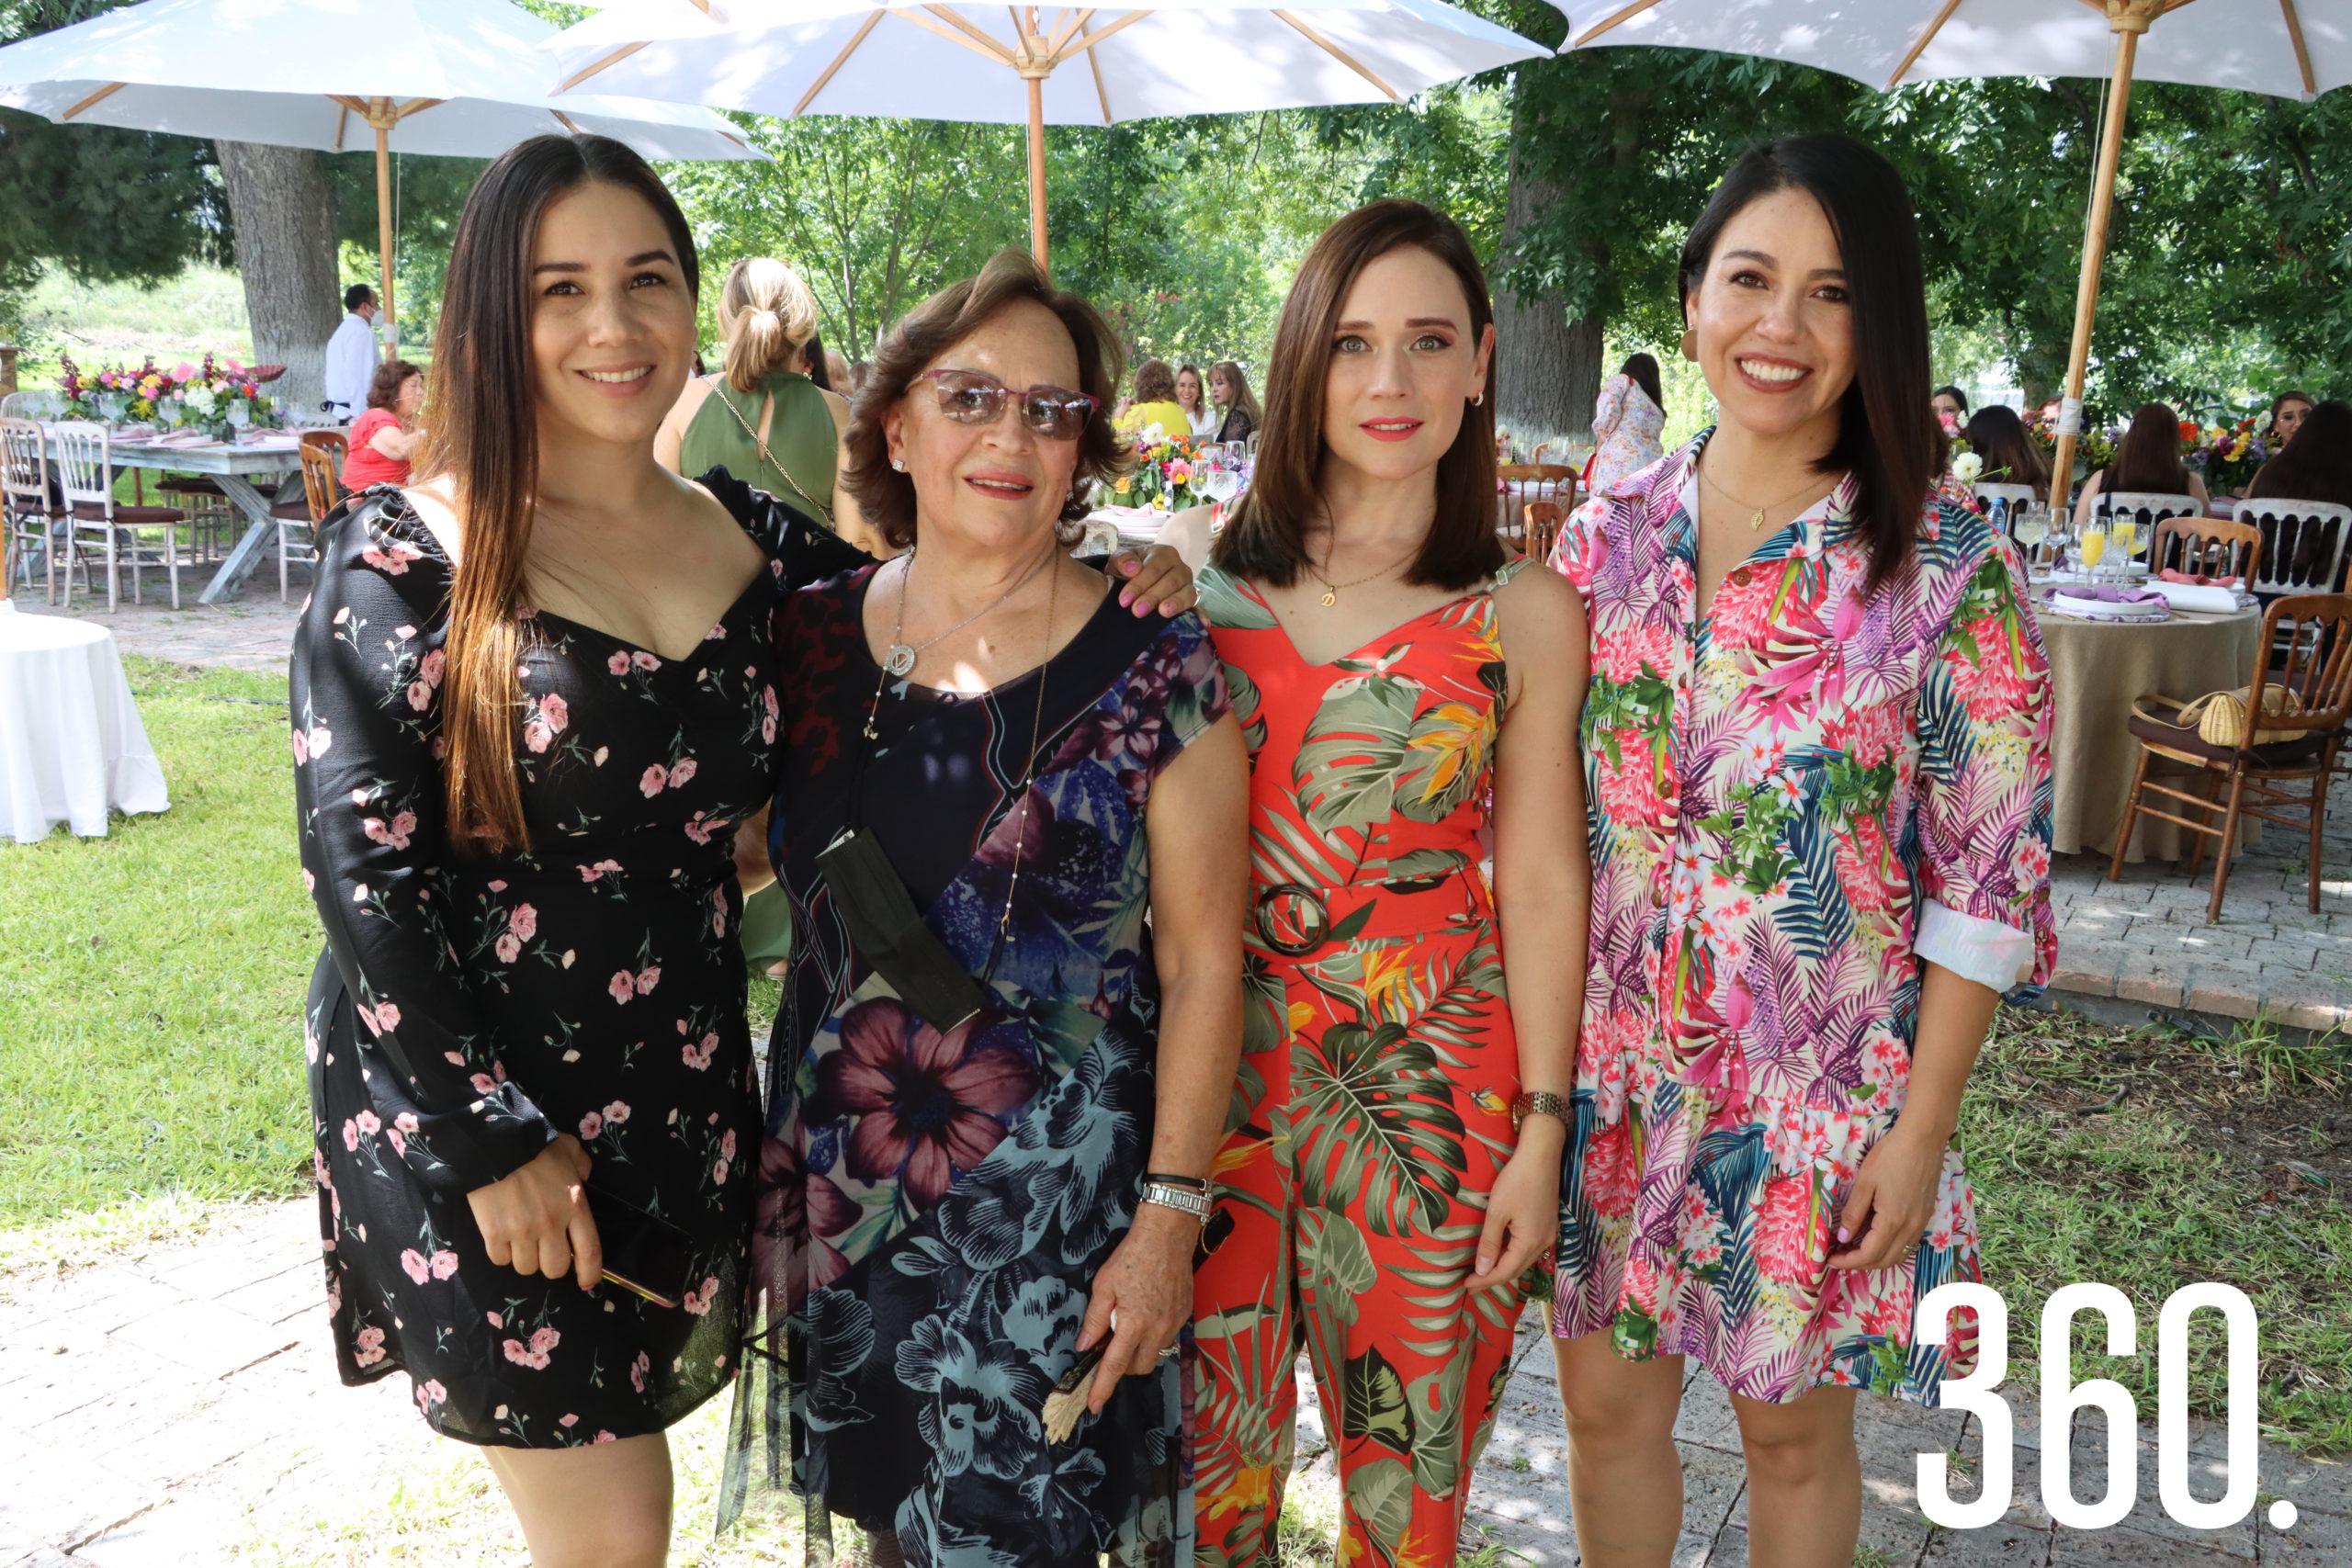 Fernanda Rodríguez, Vicky Valdés, Daniela Flores y Alejandra Valdés.